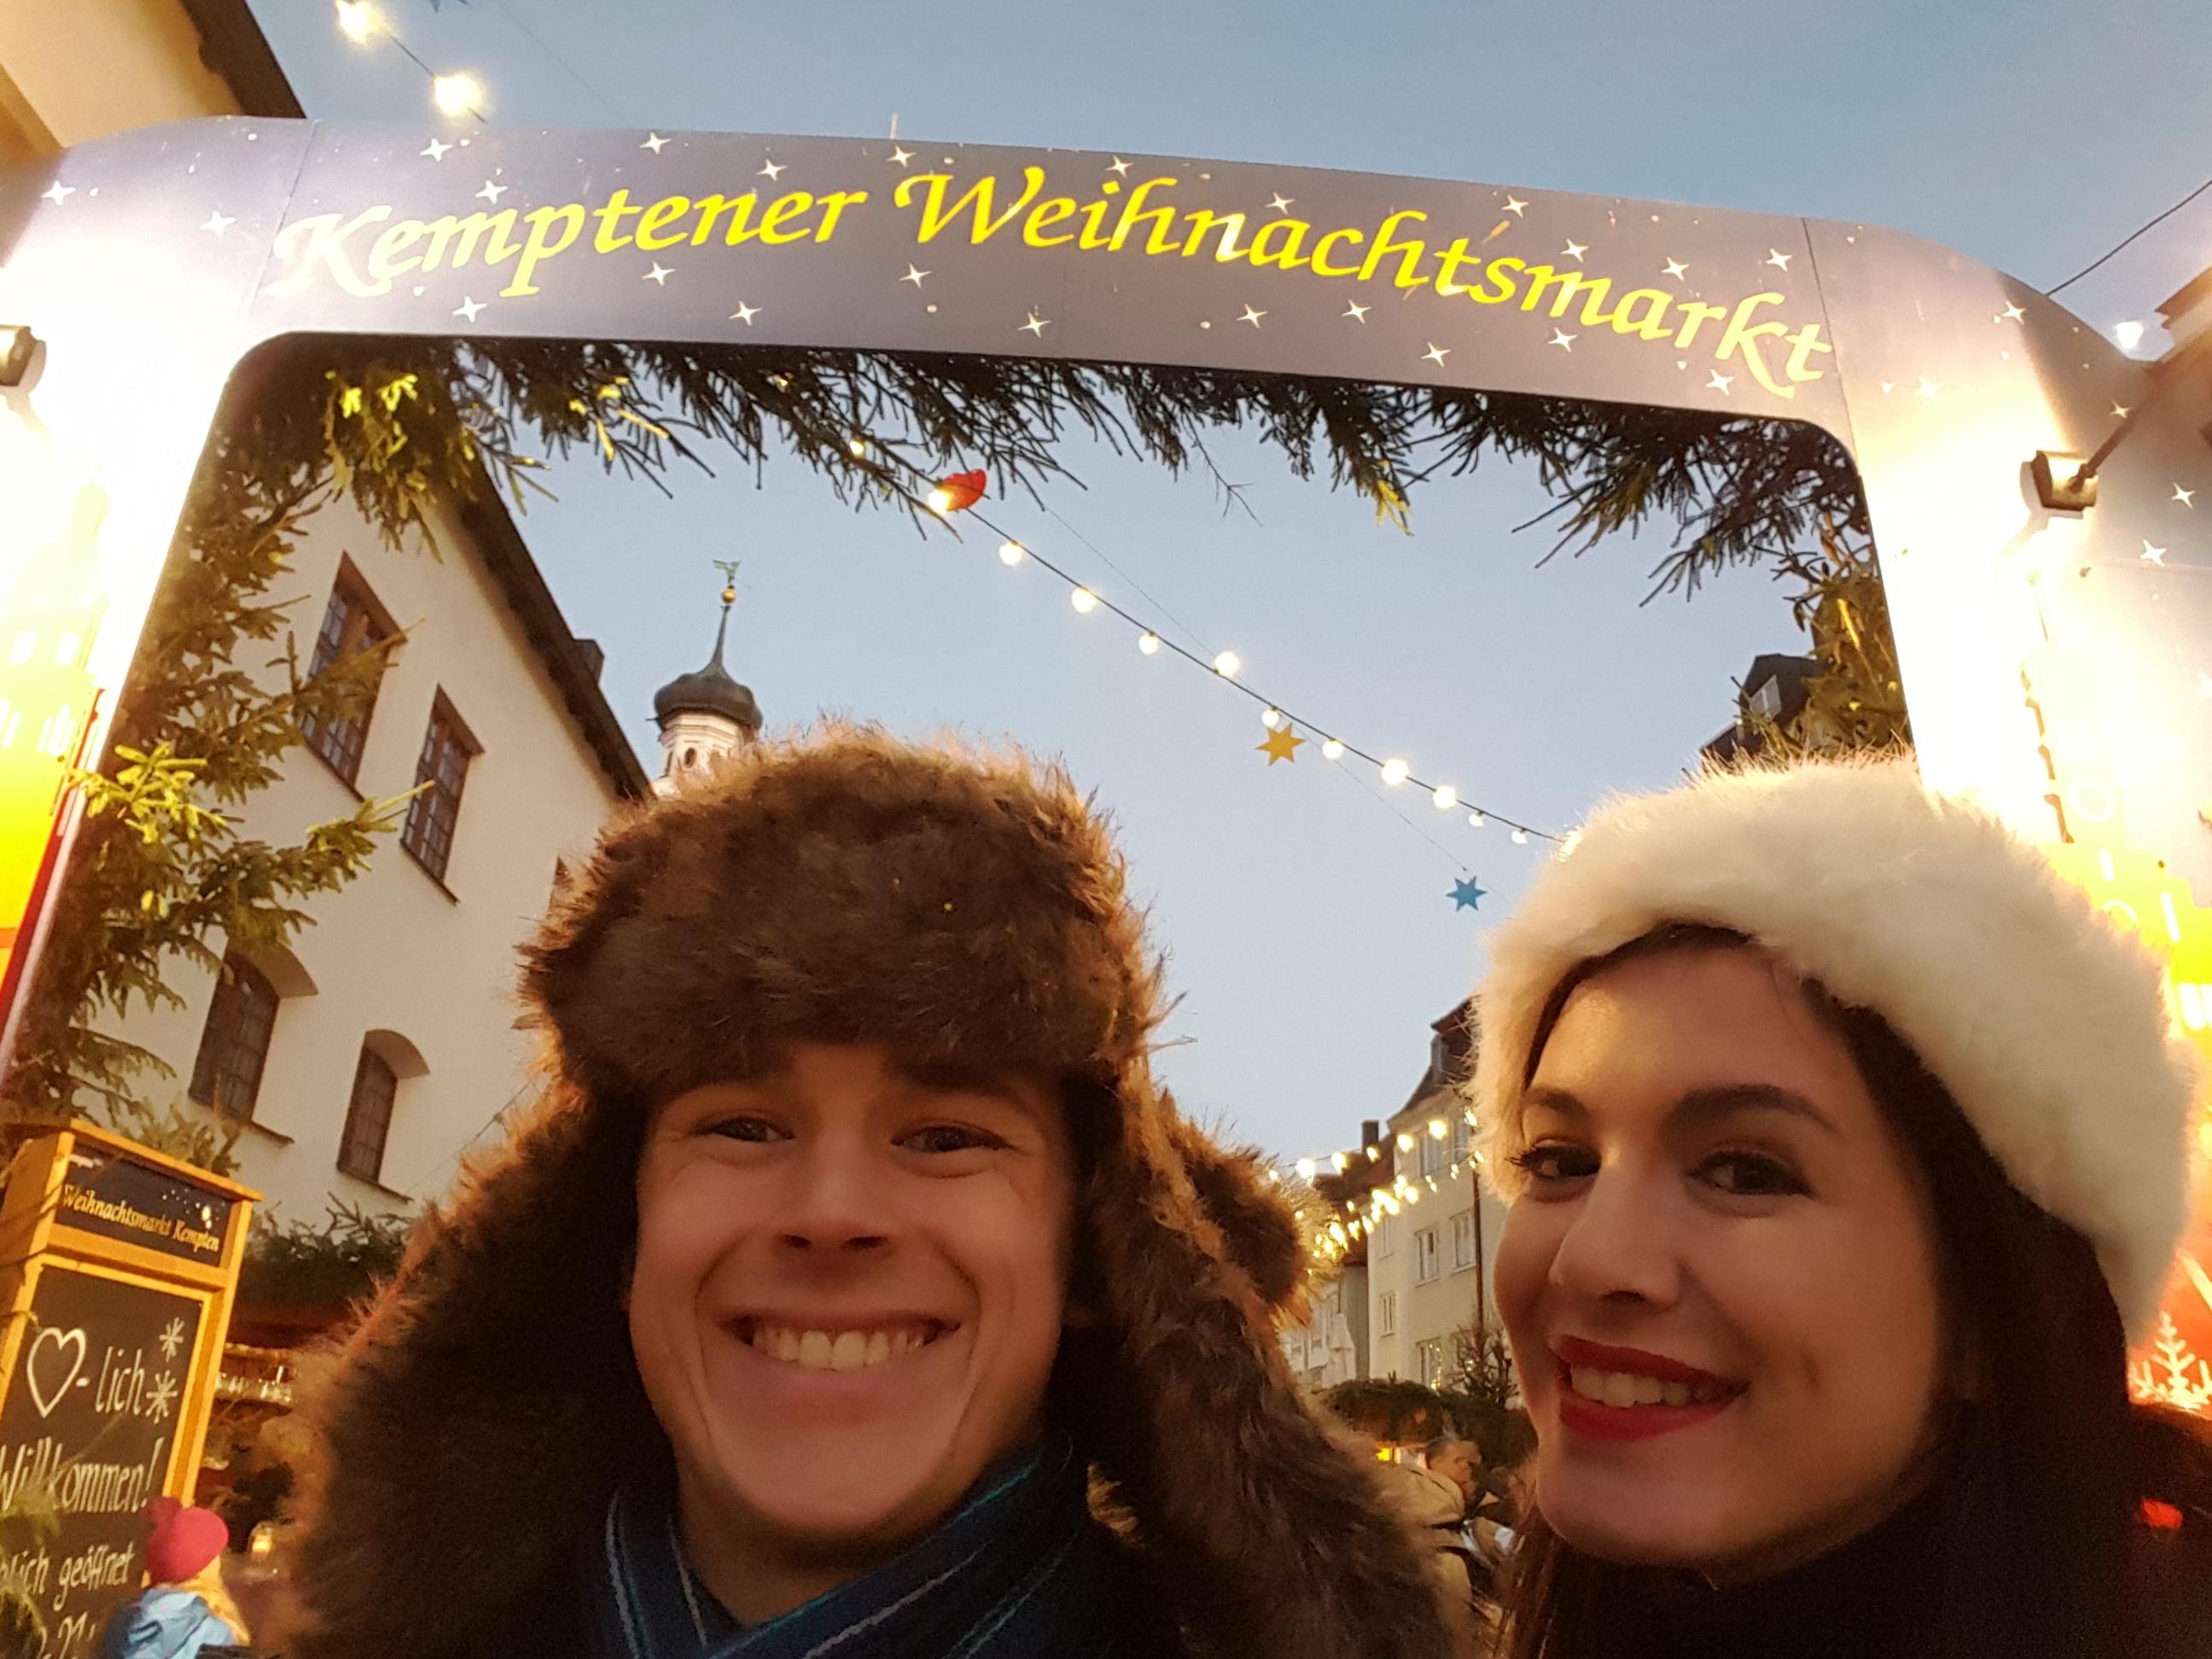 The Kempten Christmas Markets